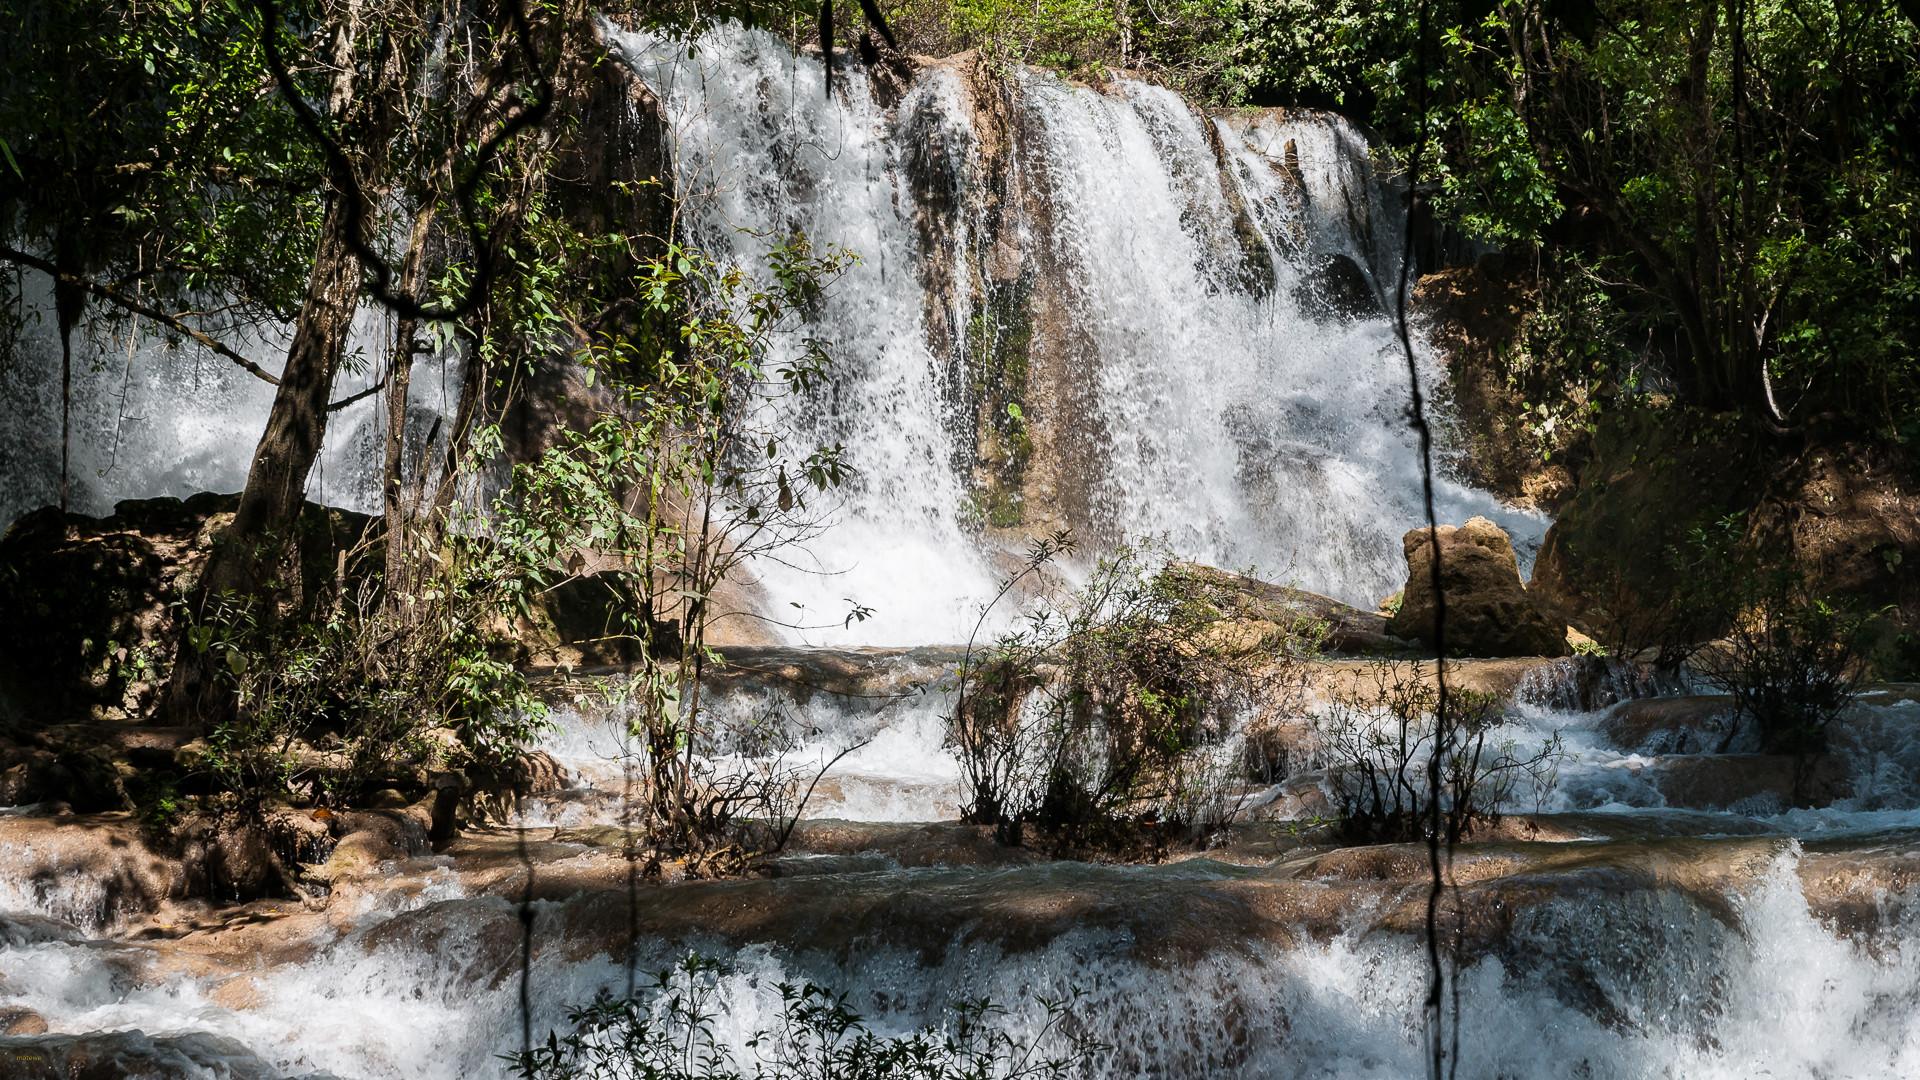 Cascadas Las Golondrinas